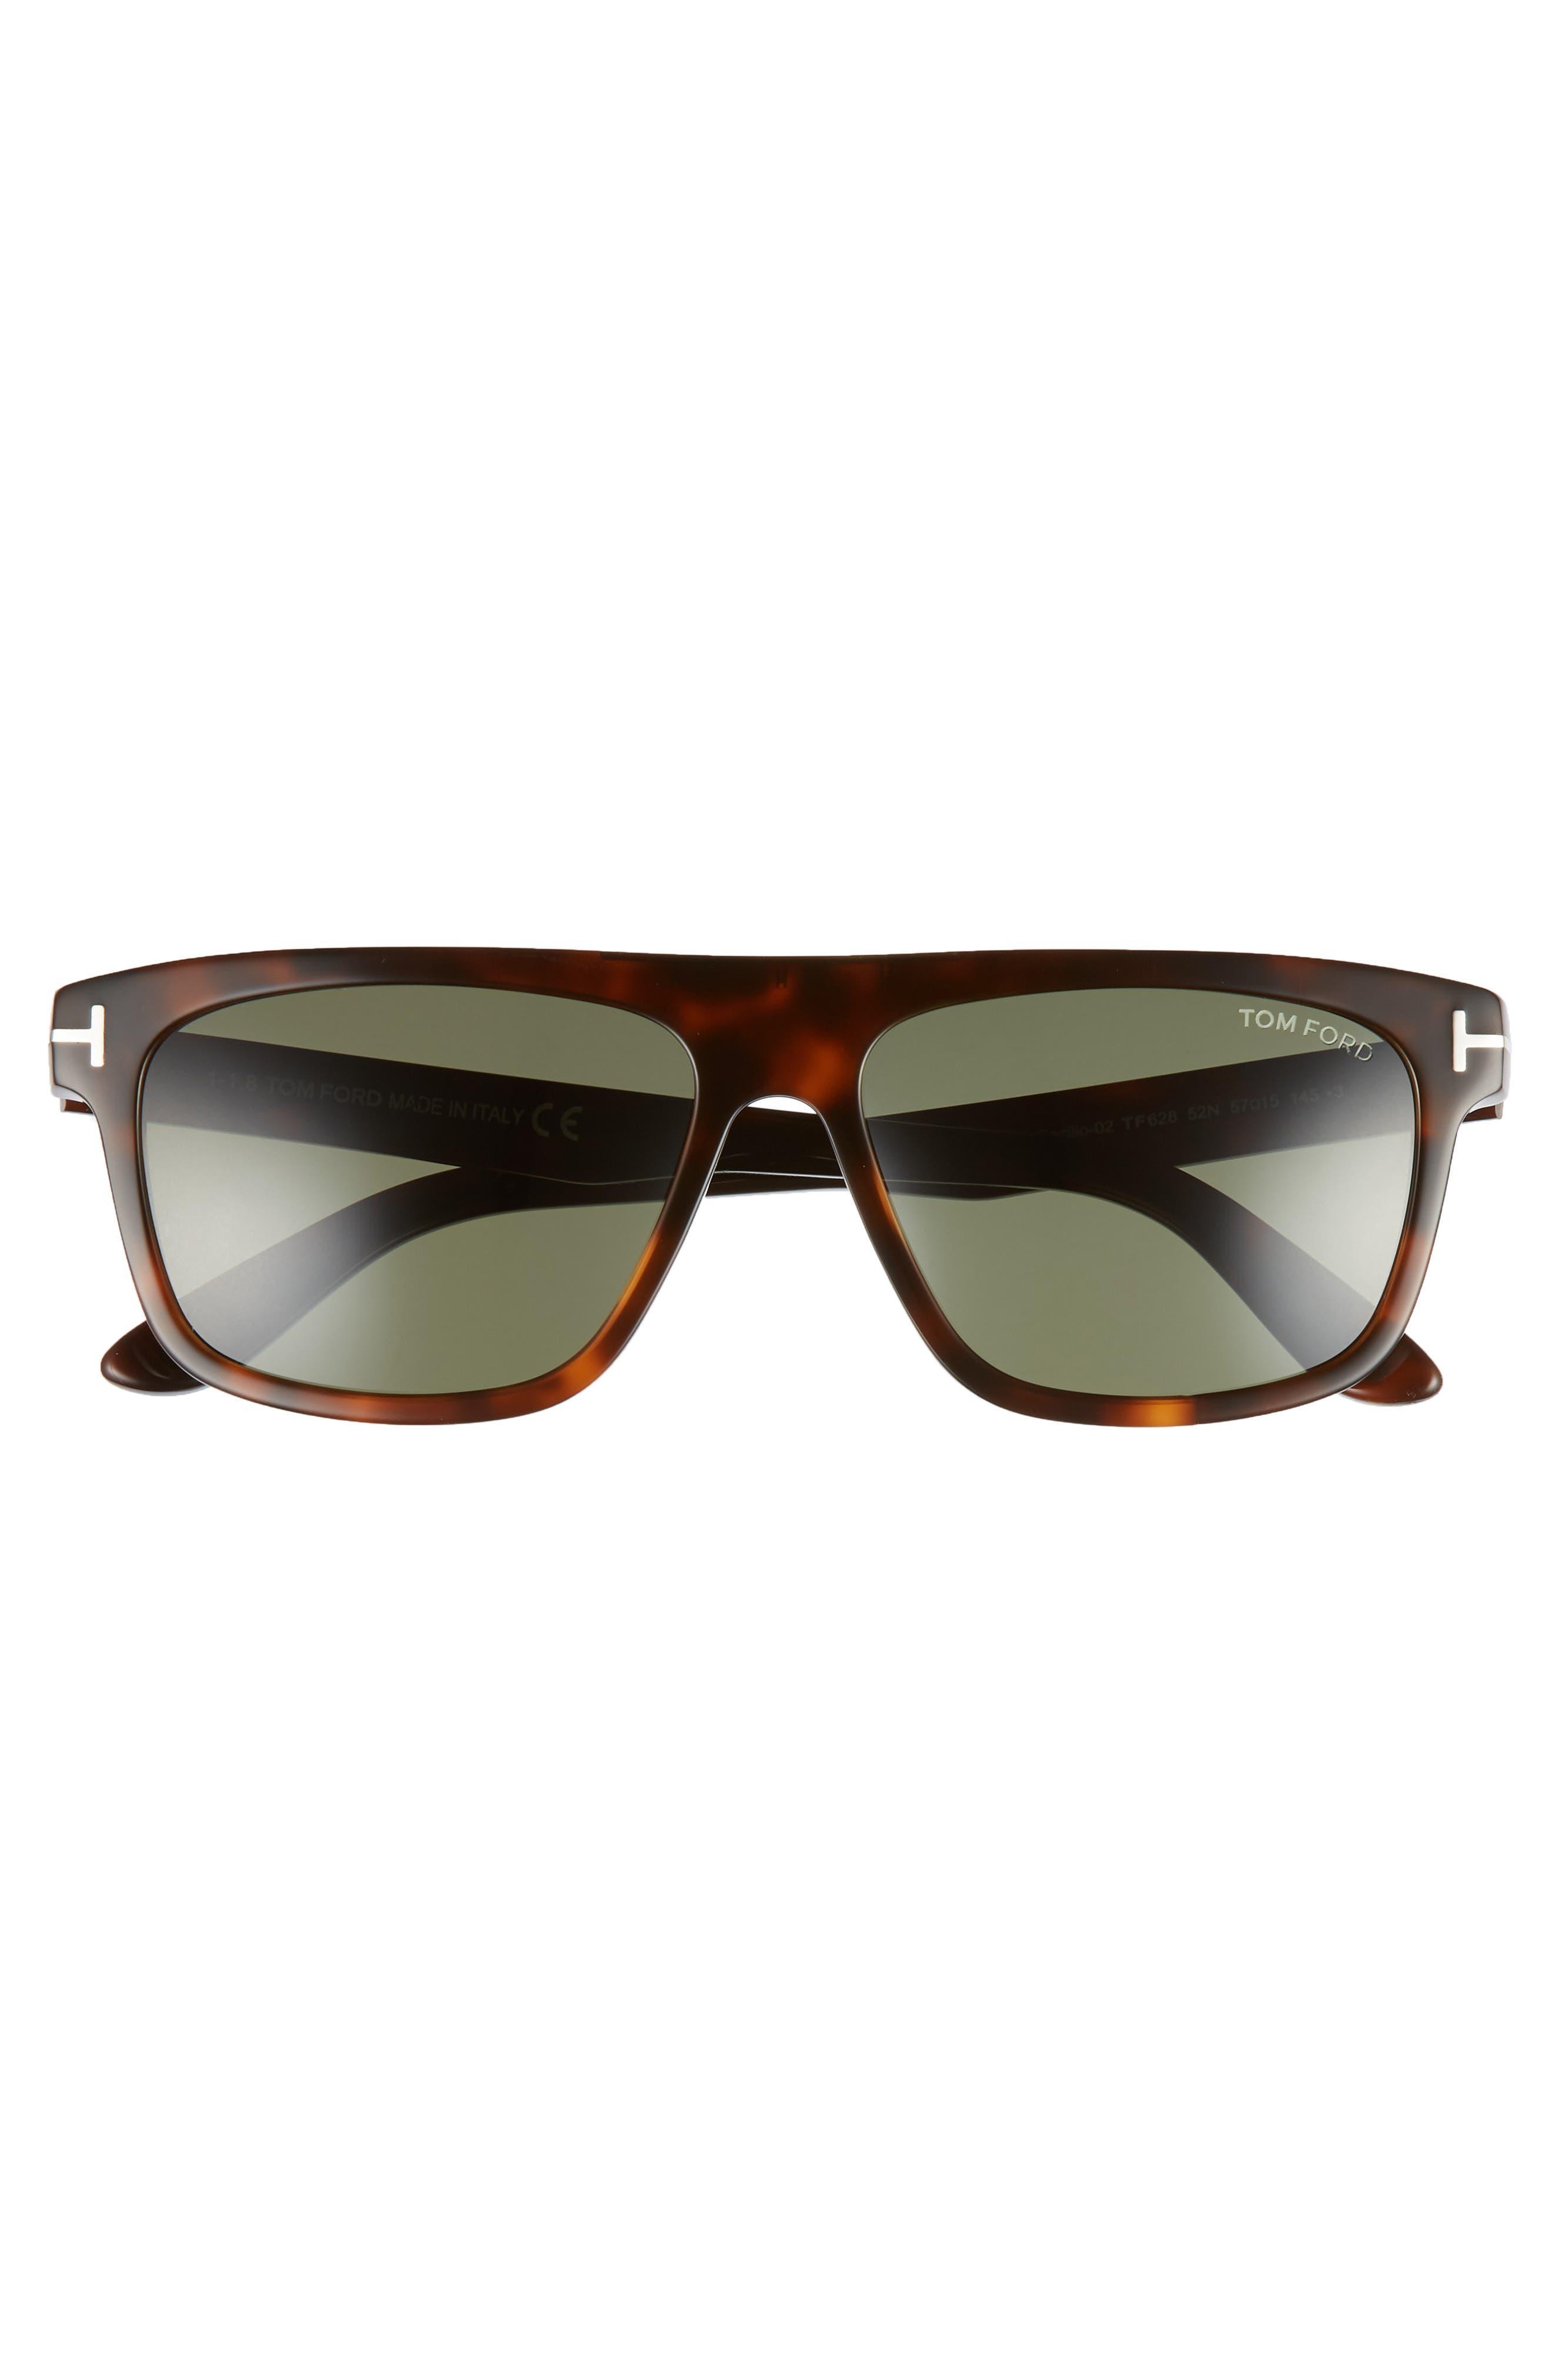 Cecilio 57mm Blue Block Optical Glasses,                             Alternate thumbnail 3, color,                             DARK HAVANA/ GREEN